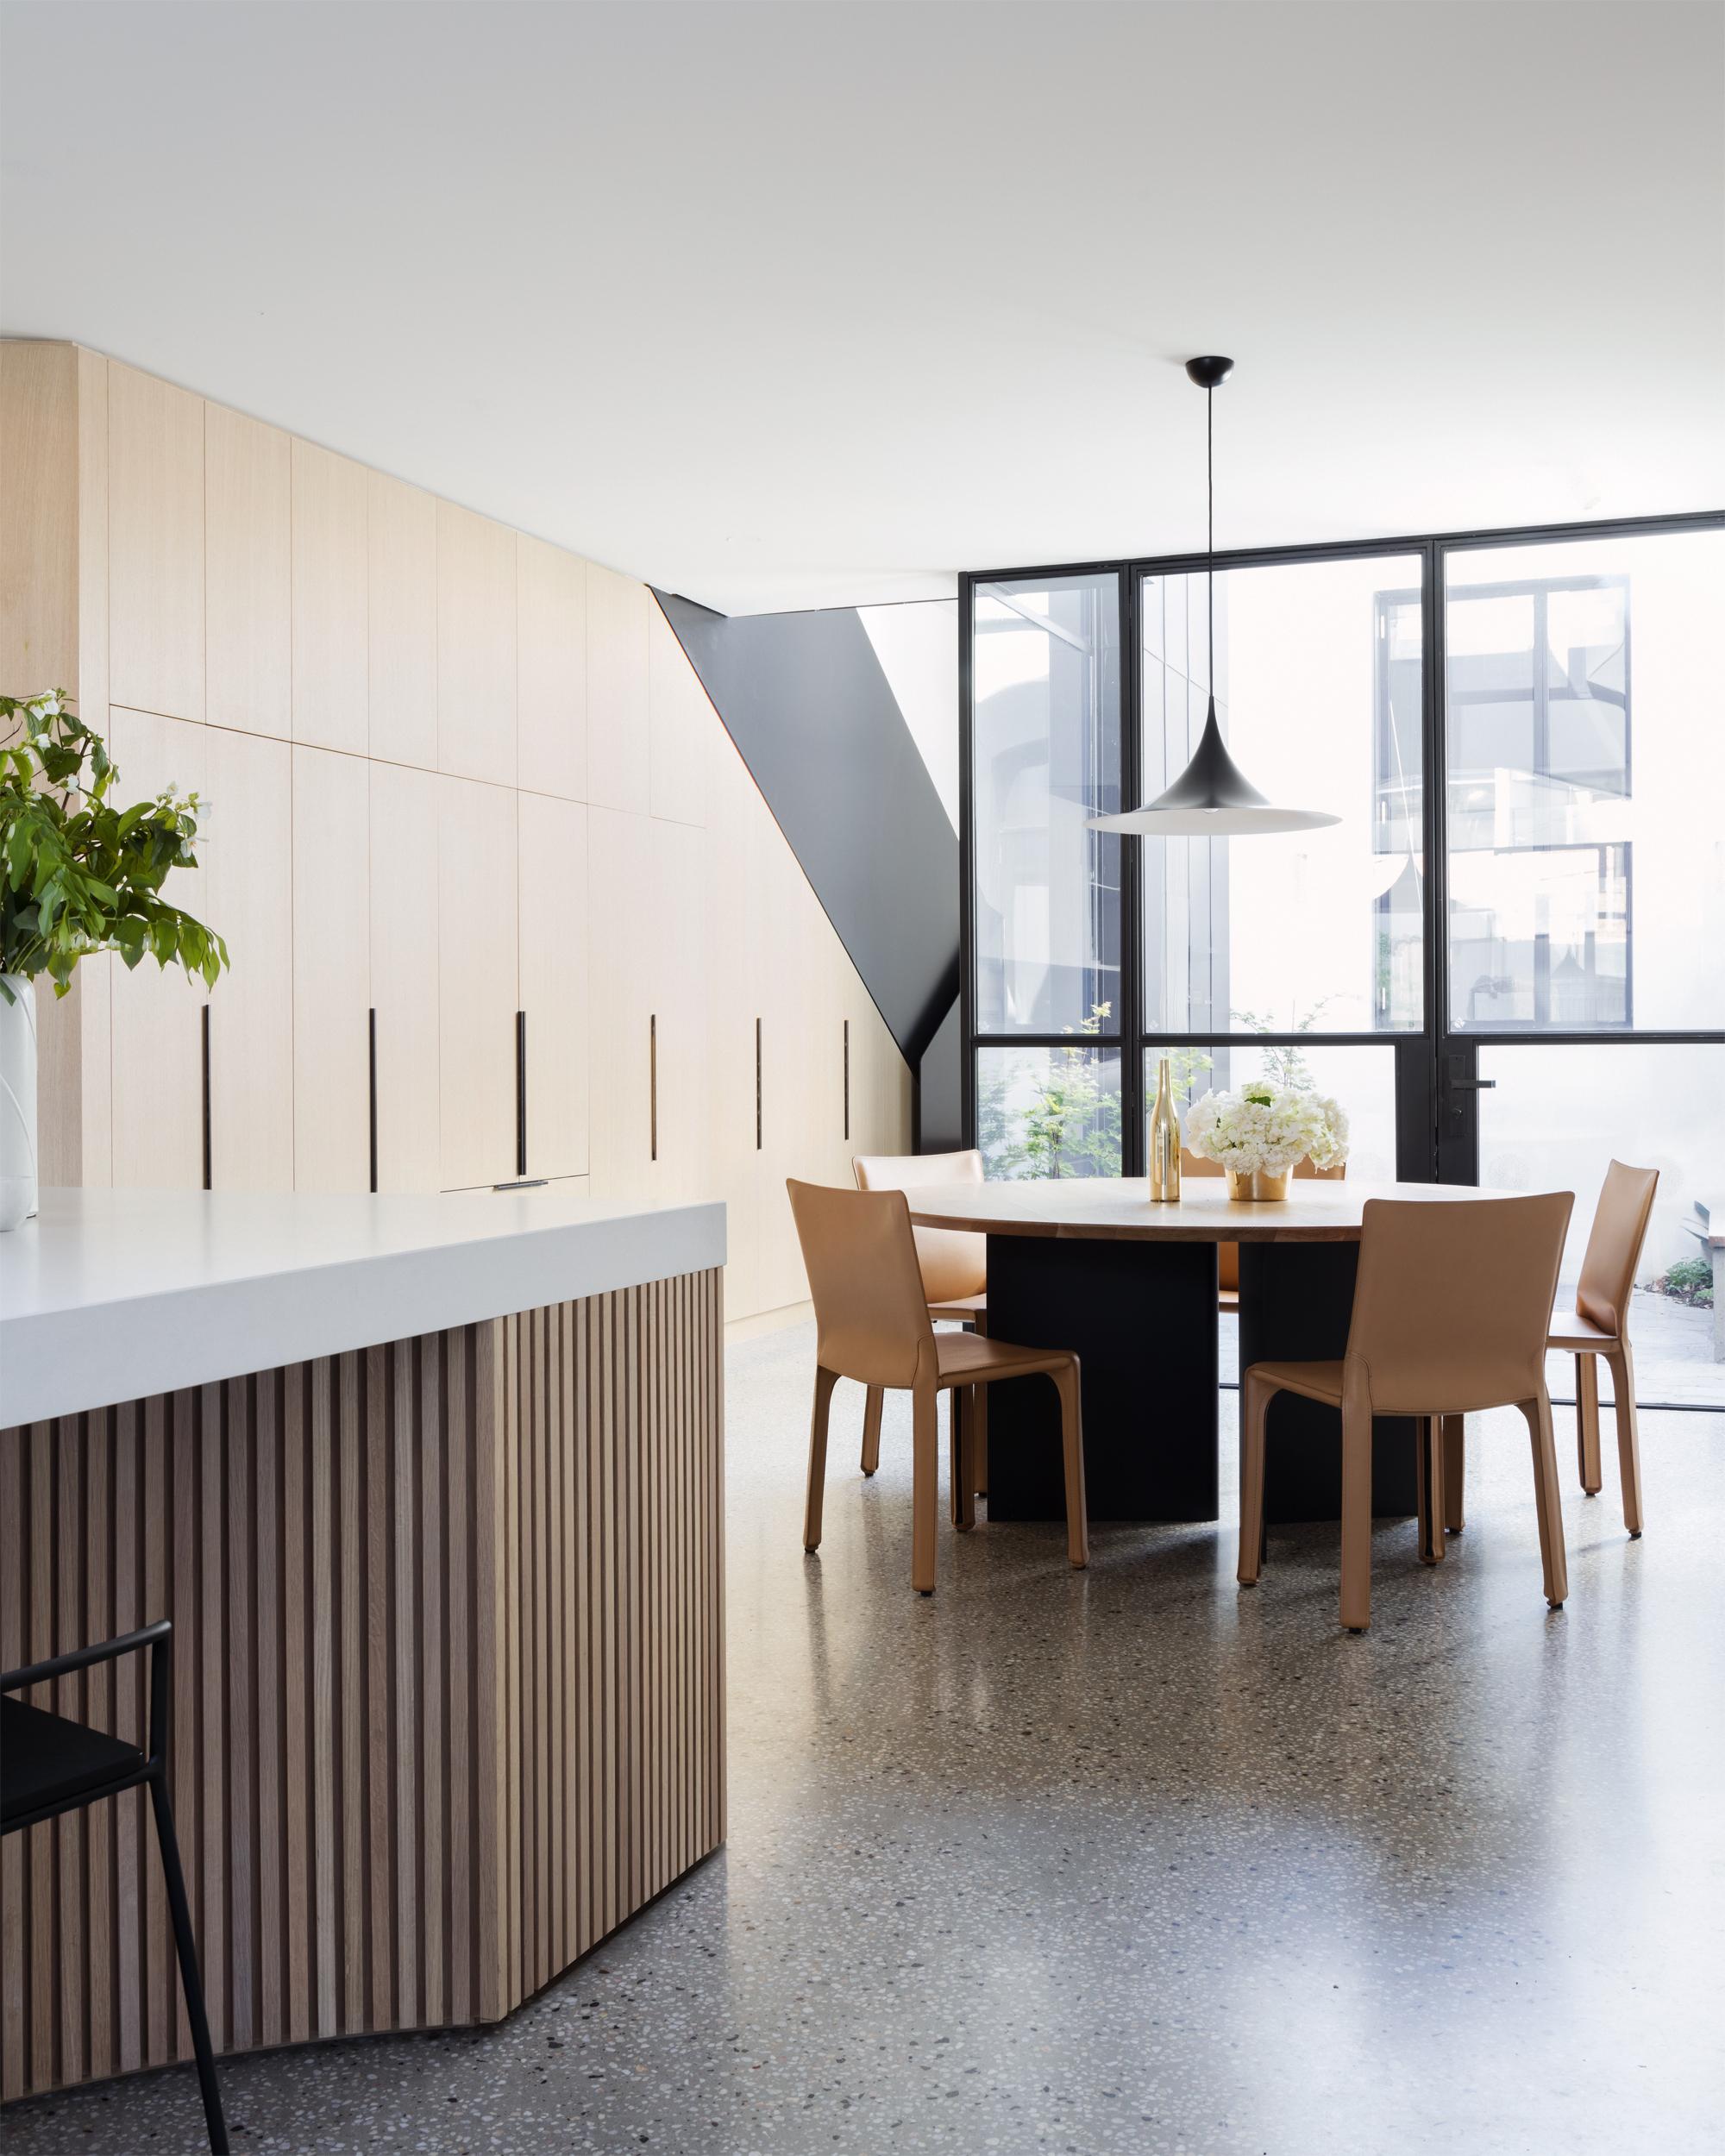 nina_provan_styling_port_melb_pandolfini_architects_1.jpg